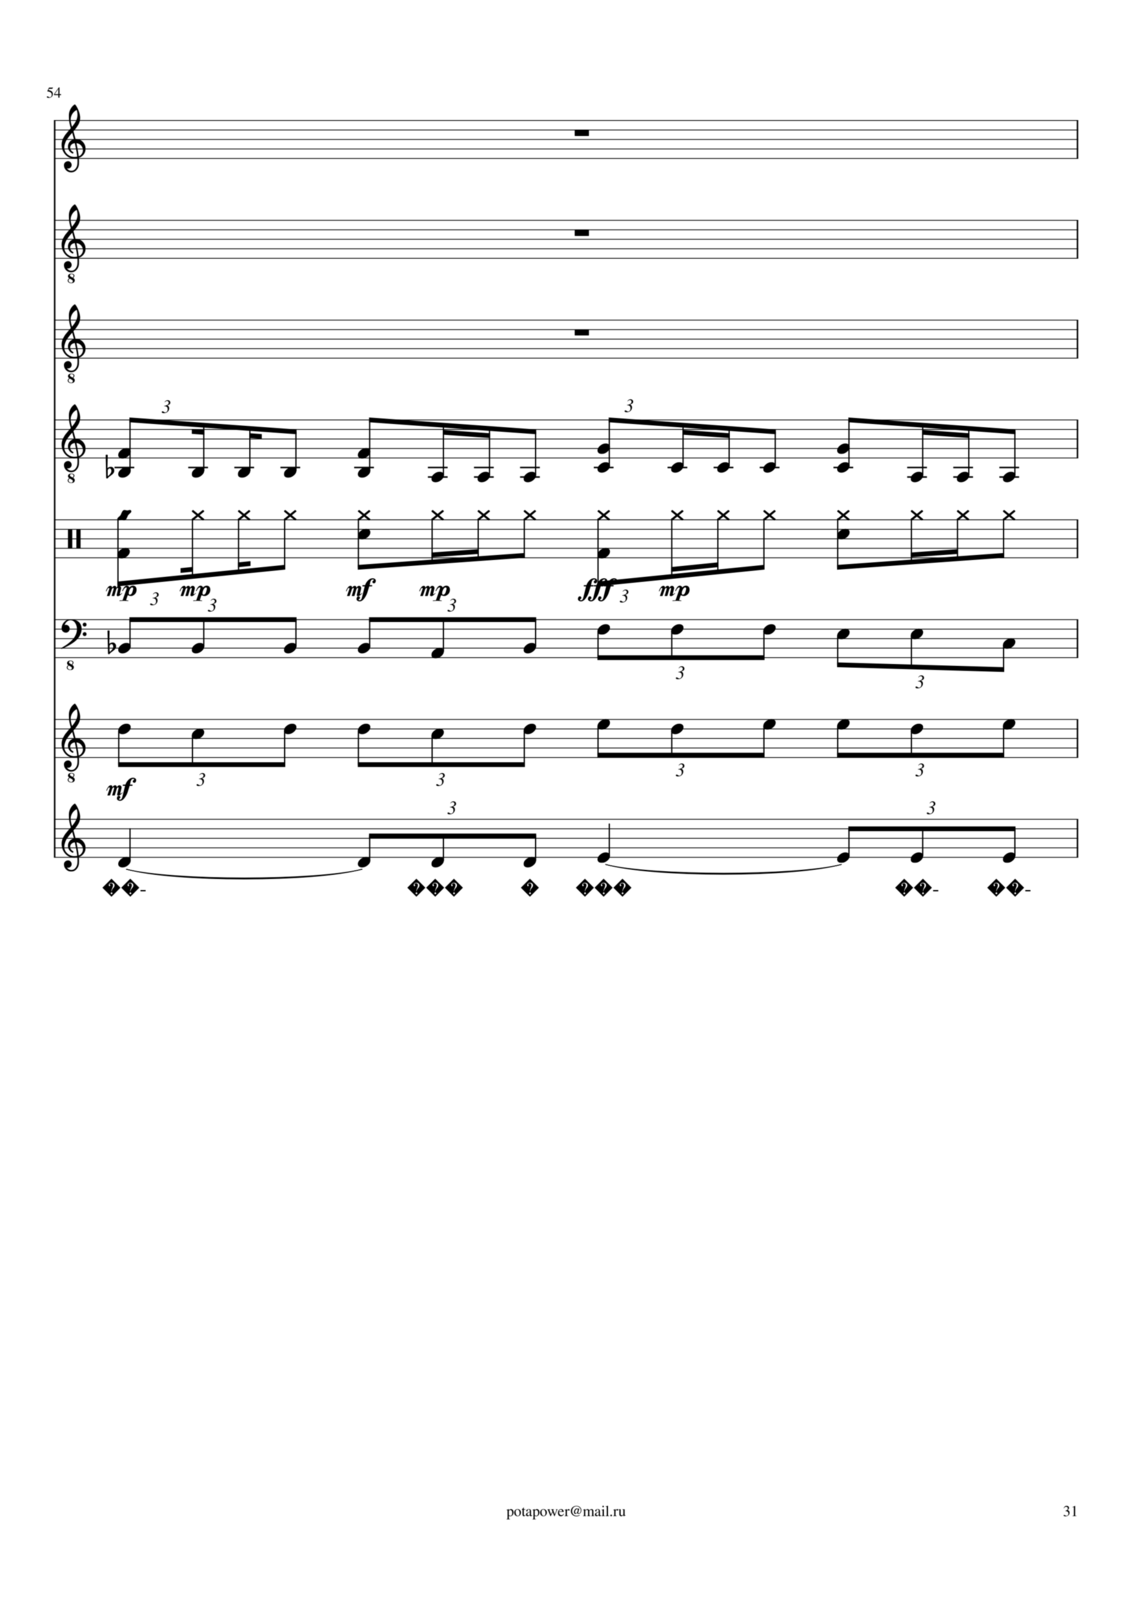 Korolevstvo slez slide, Image 31